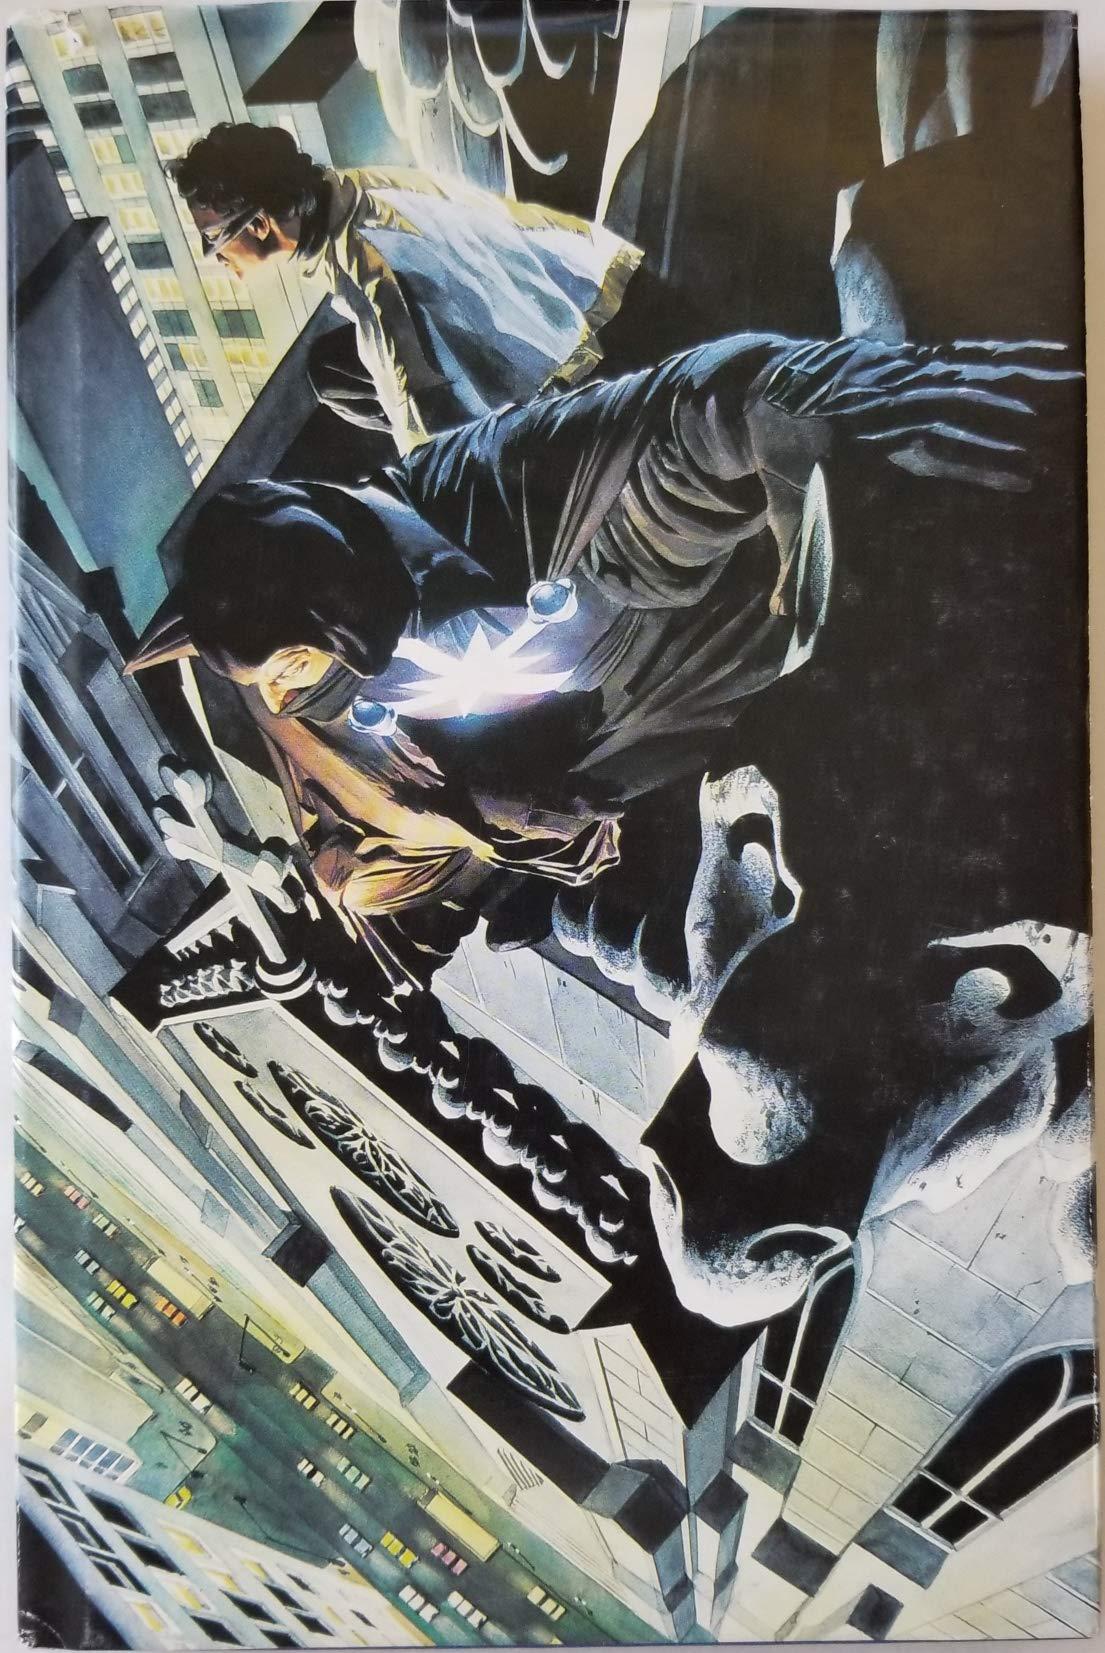 Kurt Busiek's Astro City Vol. II: Confession: 9781887279734: Amazon.com: Books